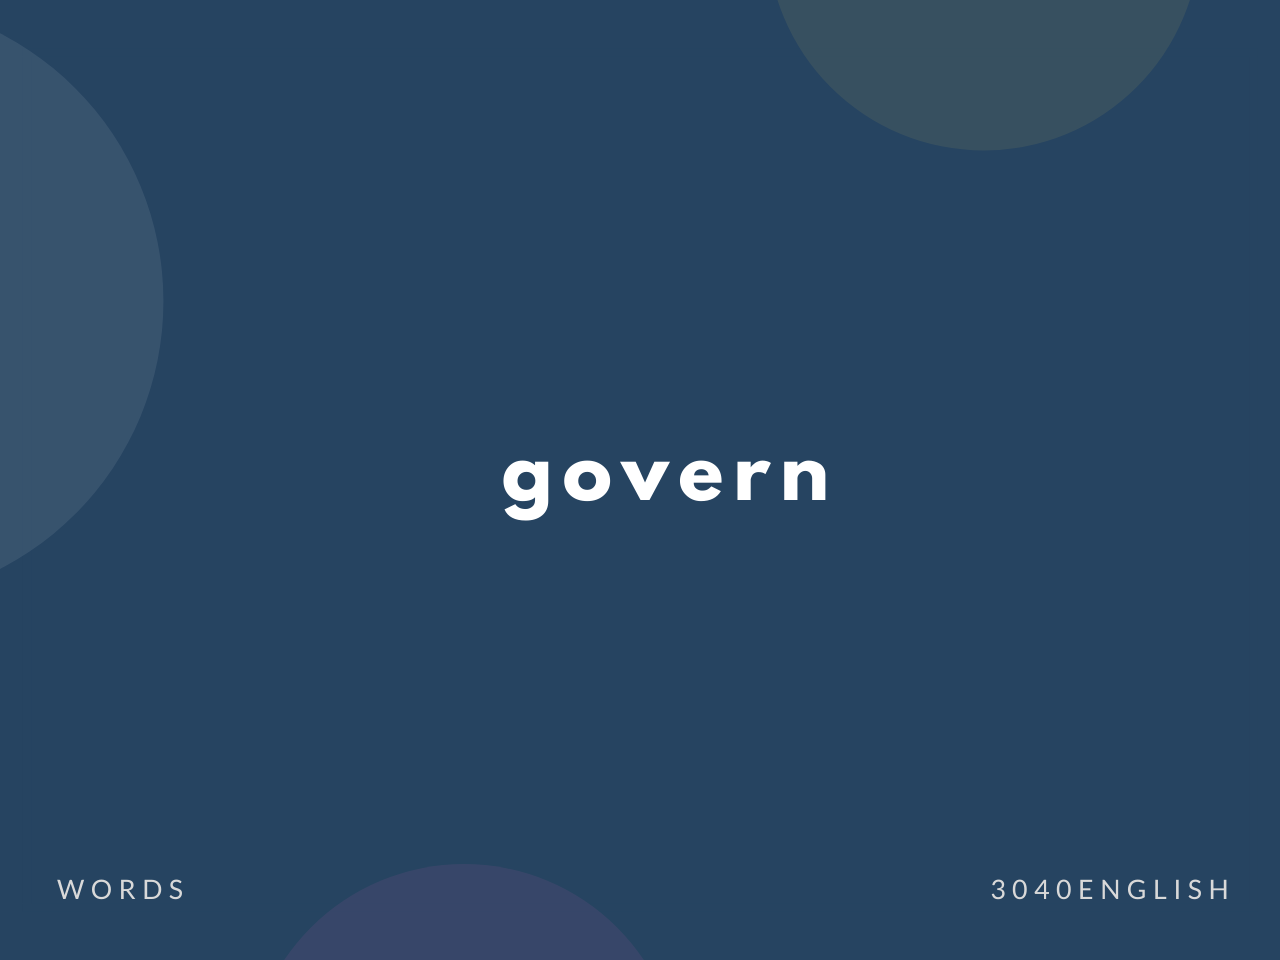 govern の意味と簡単な使い方【音読用例文あり】